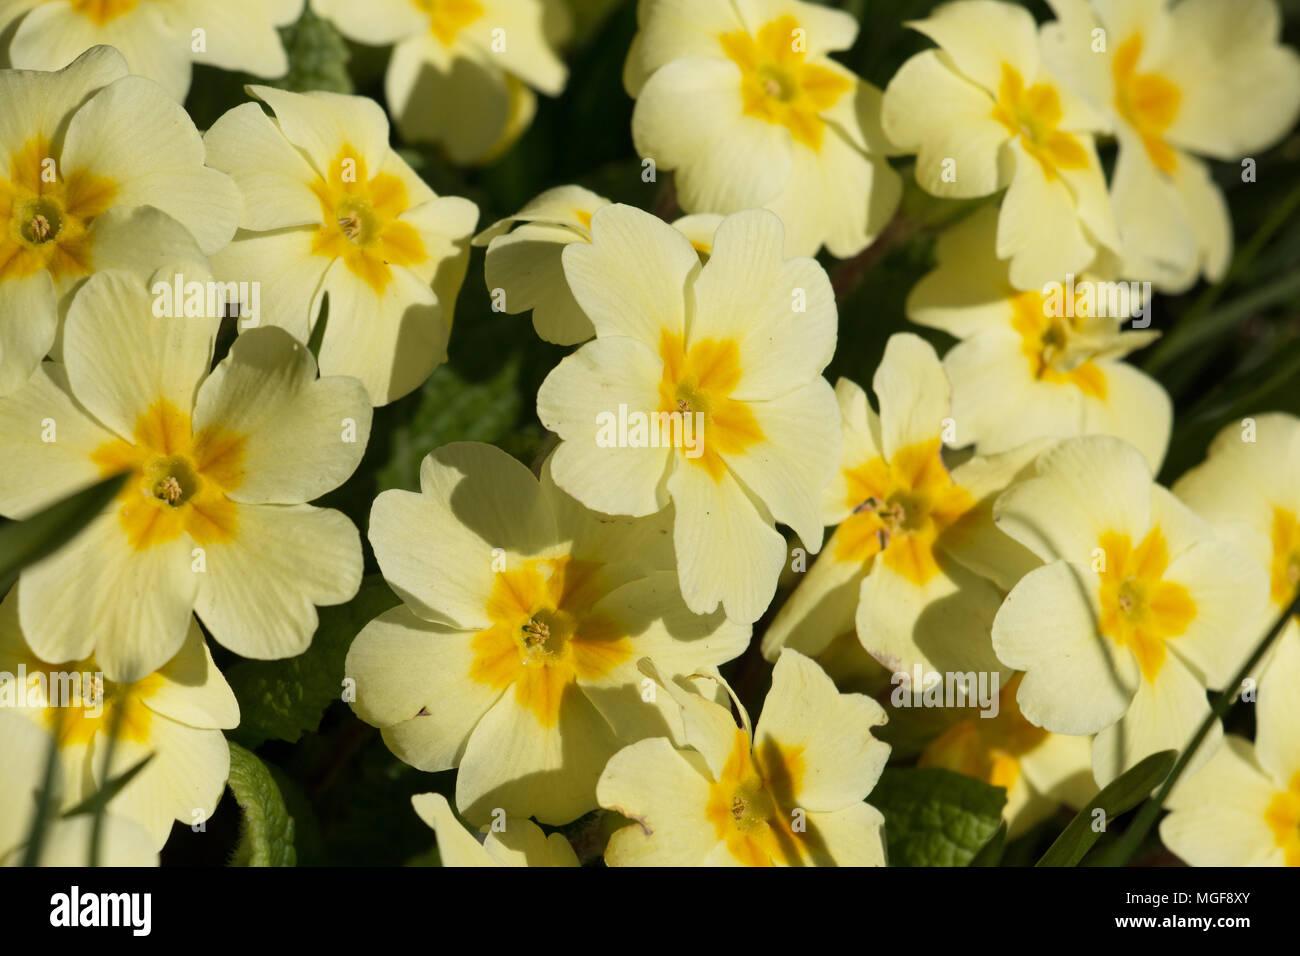 Cluster Of Yellow Primrose Flowers Primula Vulgaris Blooming In